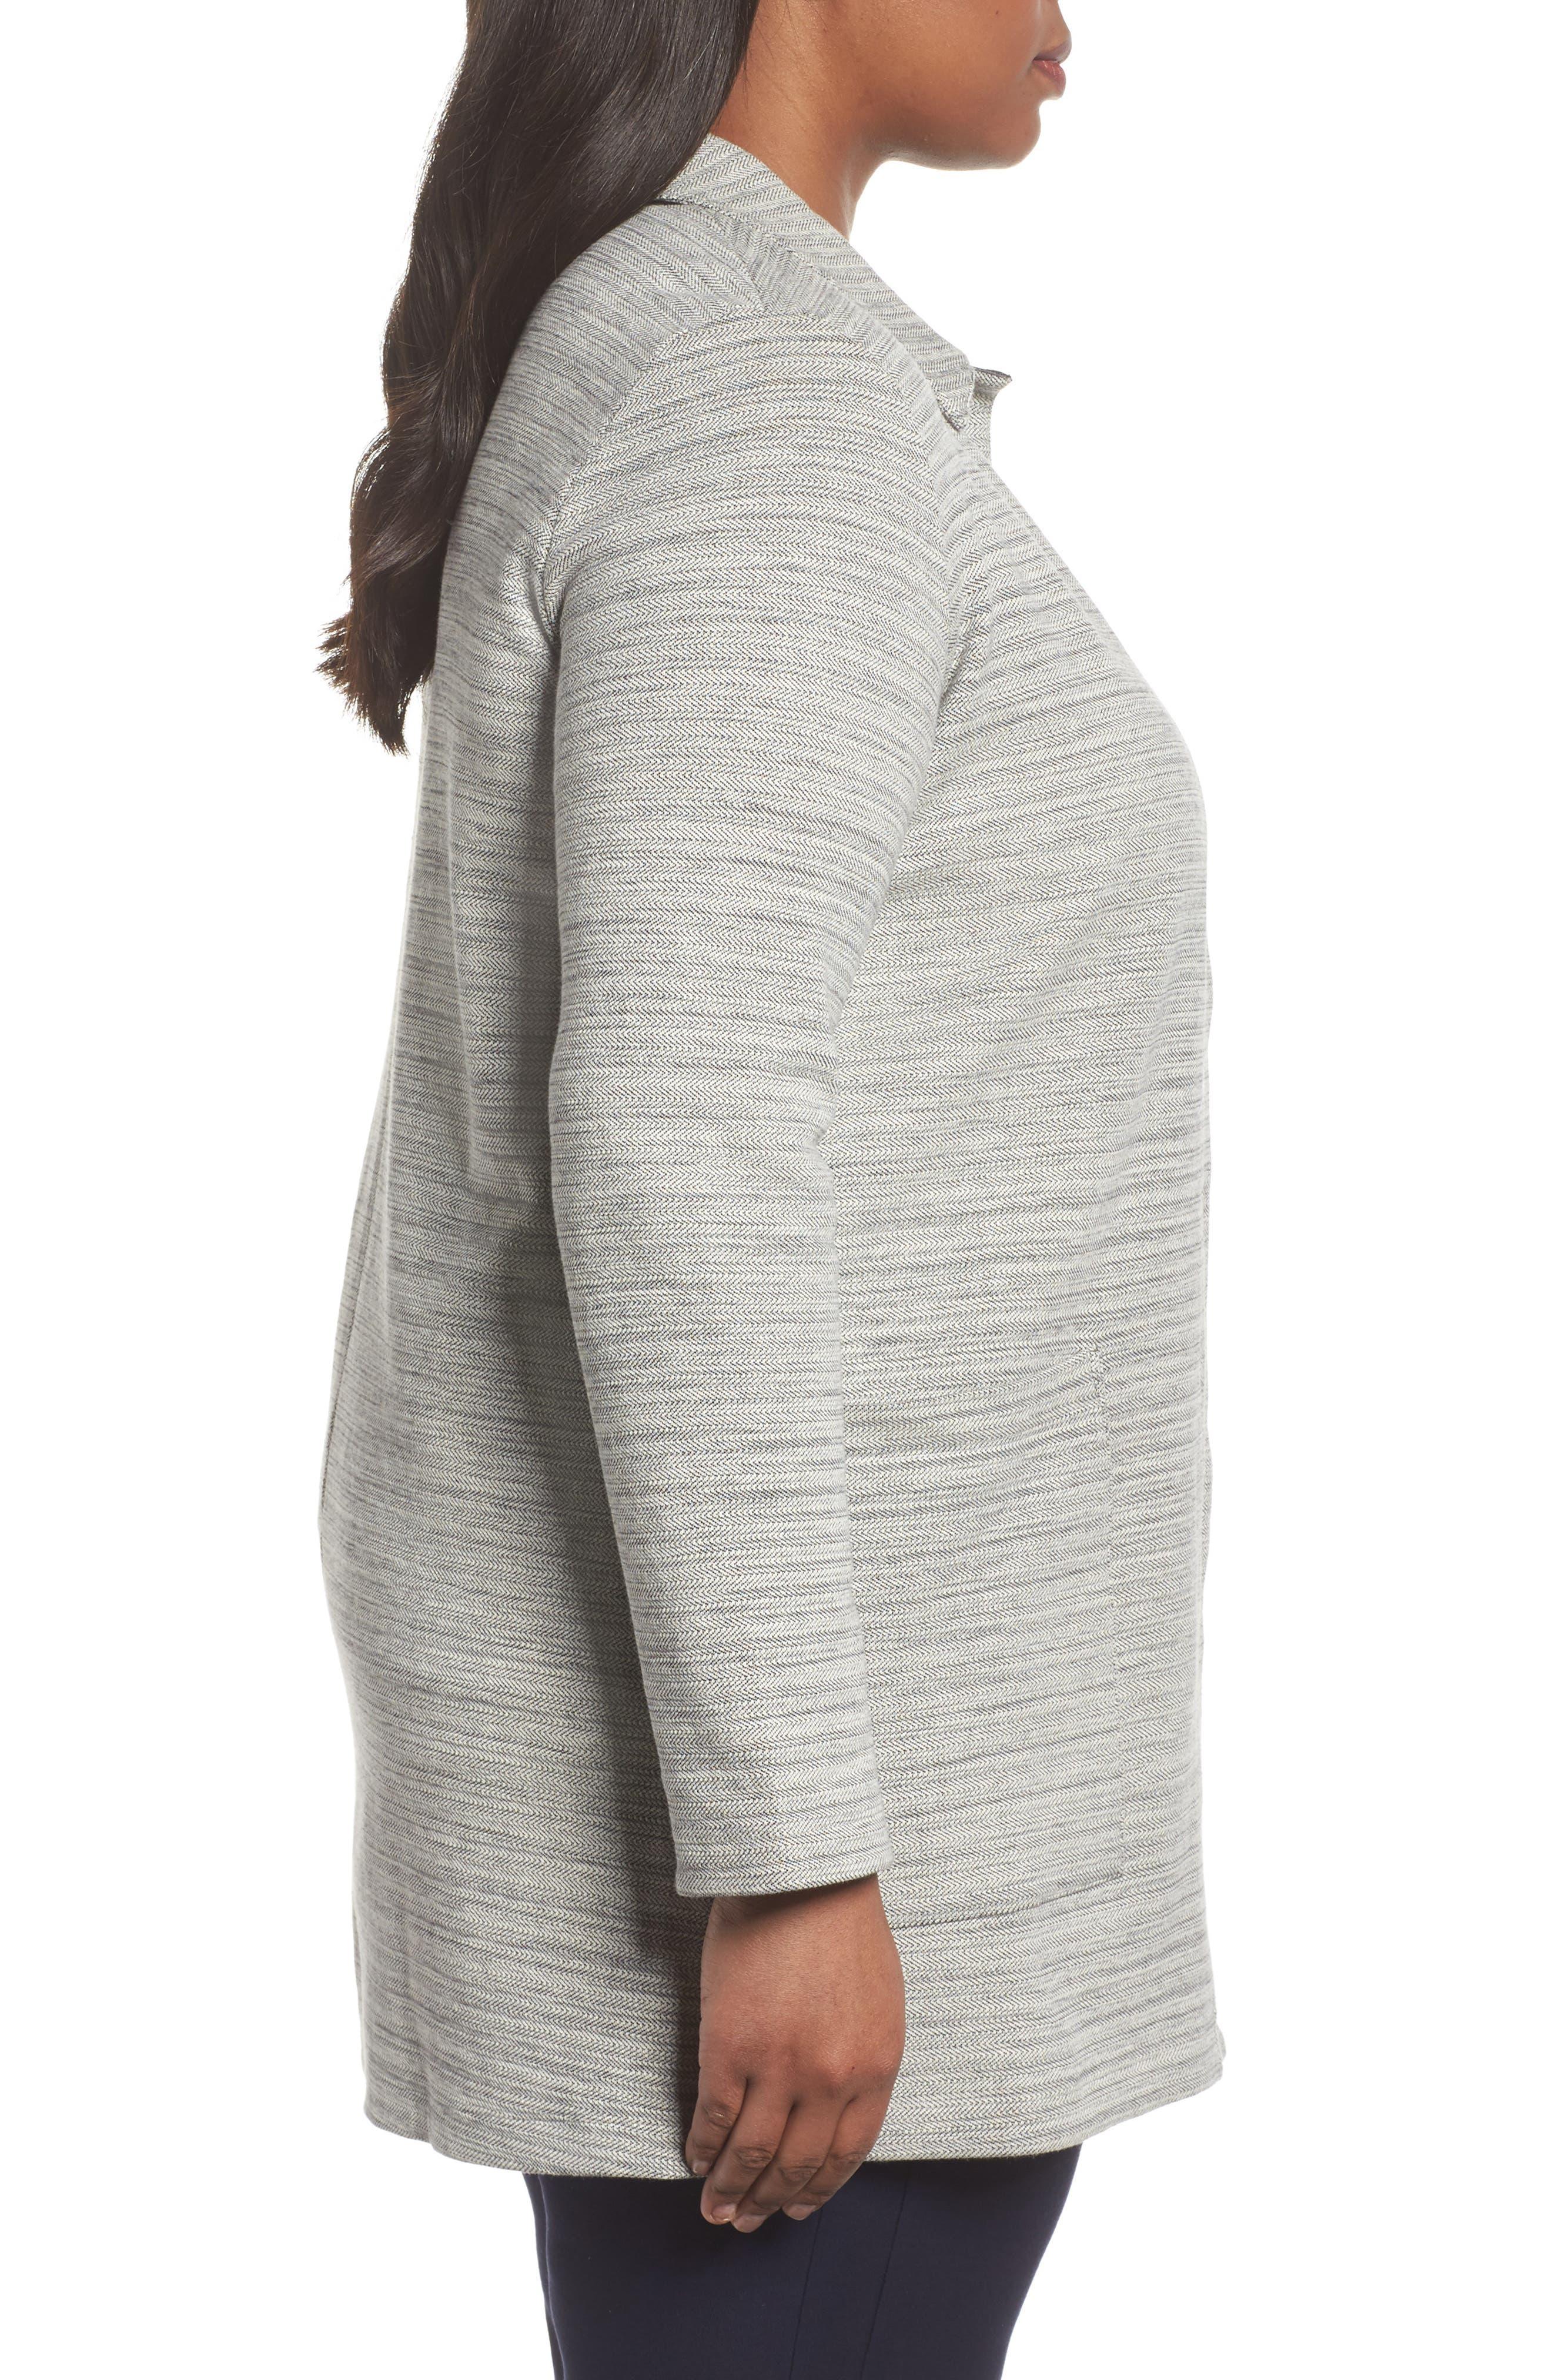 Cotton Blend Tweed Jacket,                             Alternate thumbnail 3, color,                             022